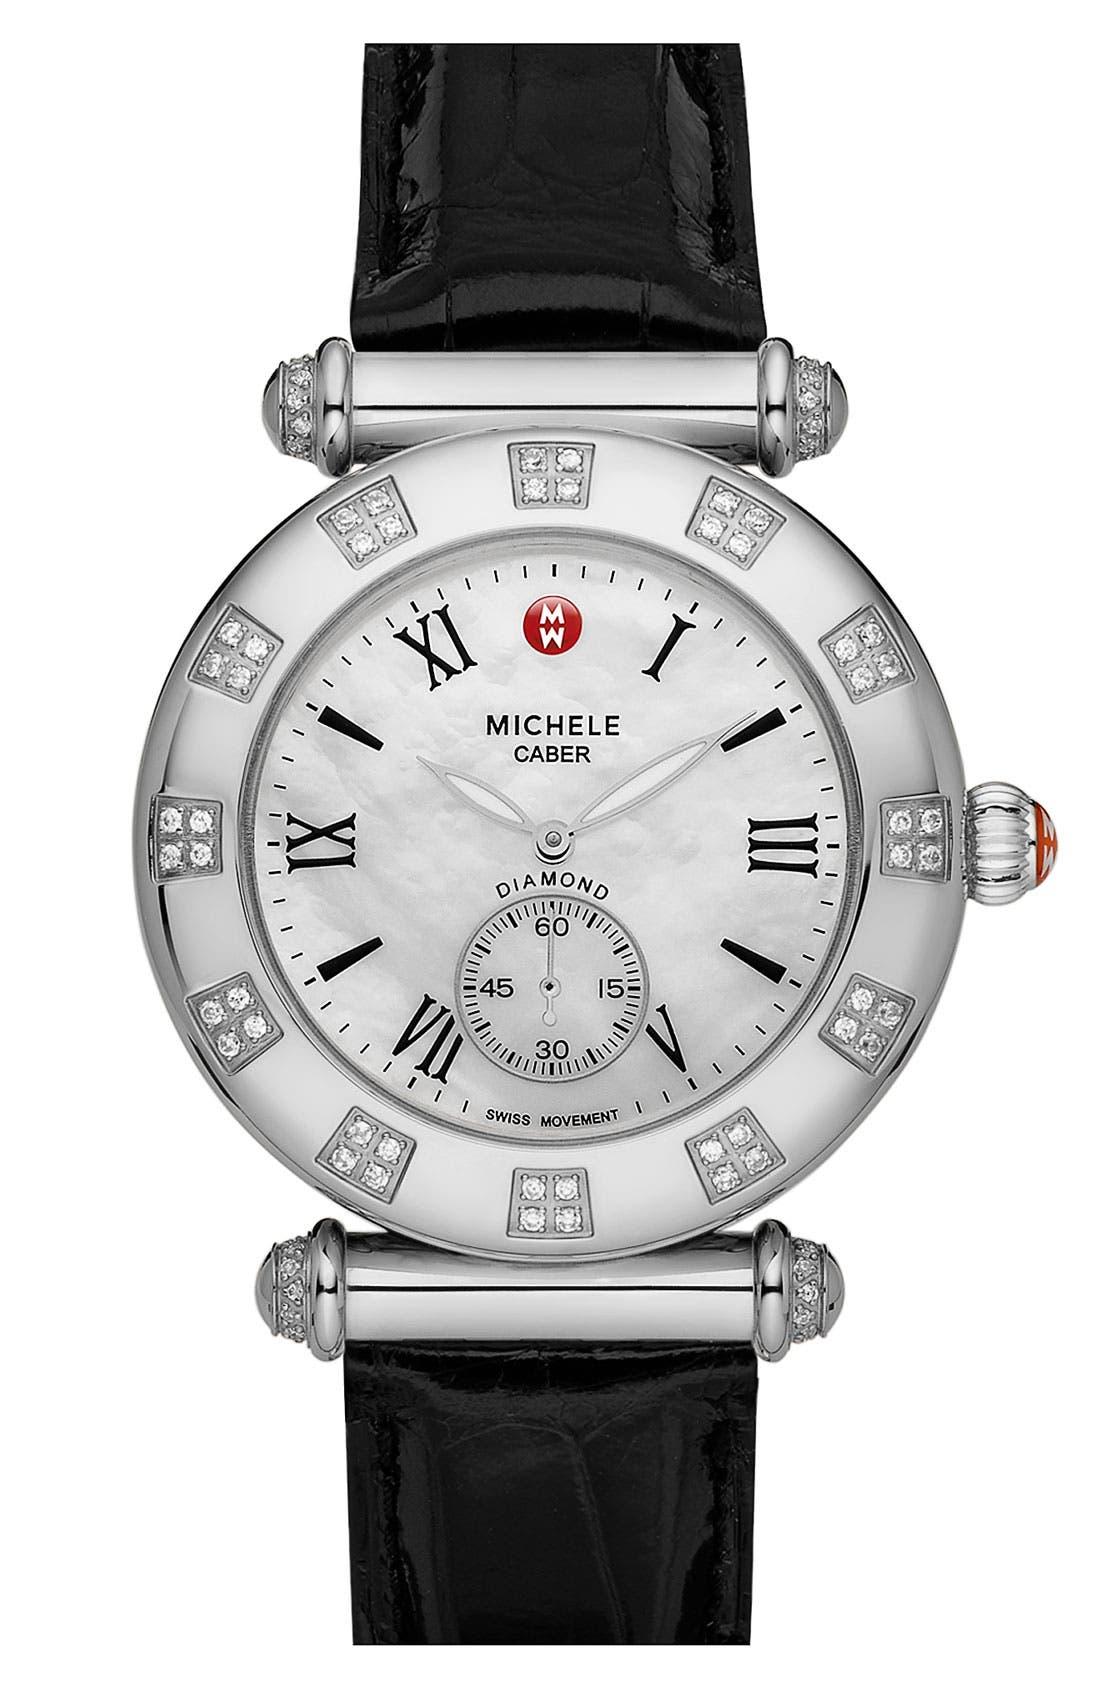 Alternate Image 1 Selected - MICHELE 'Caber Atlas' Diamond Customizable Watch